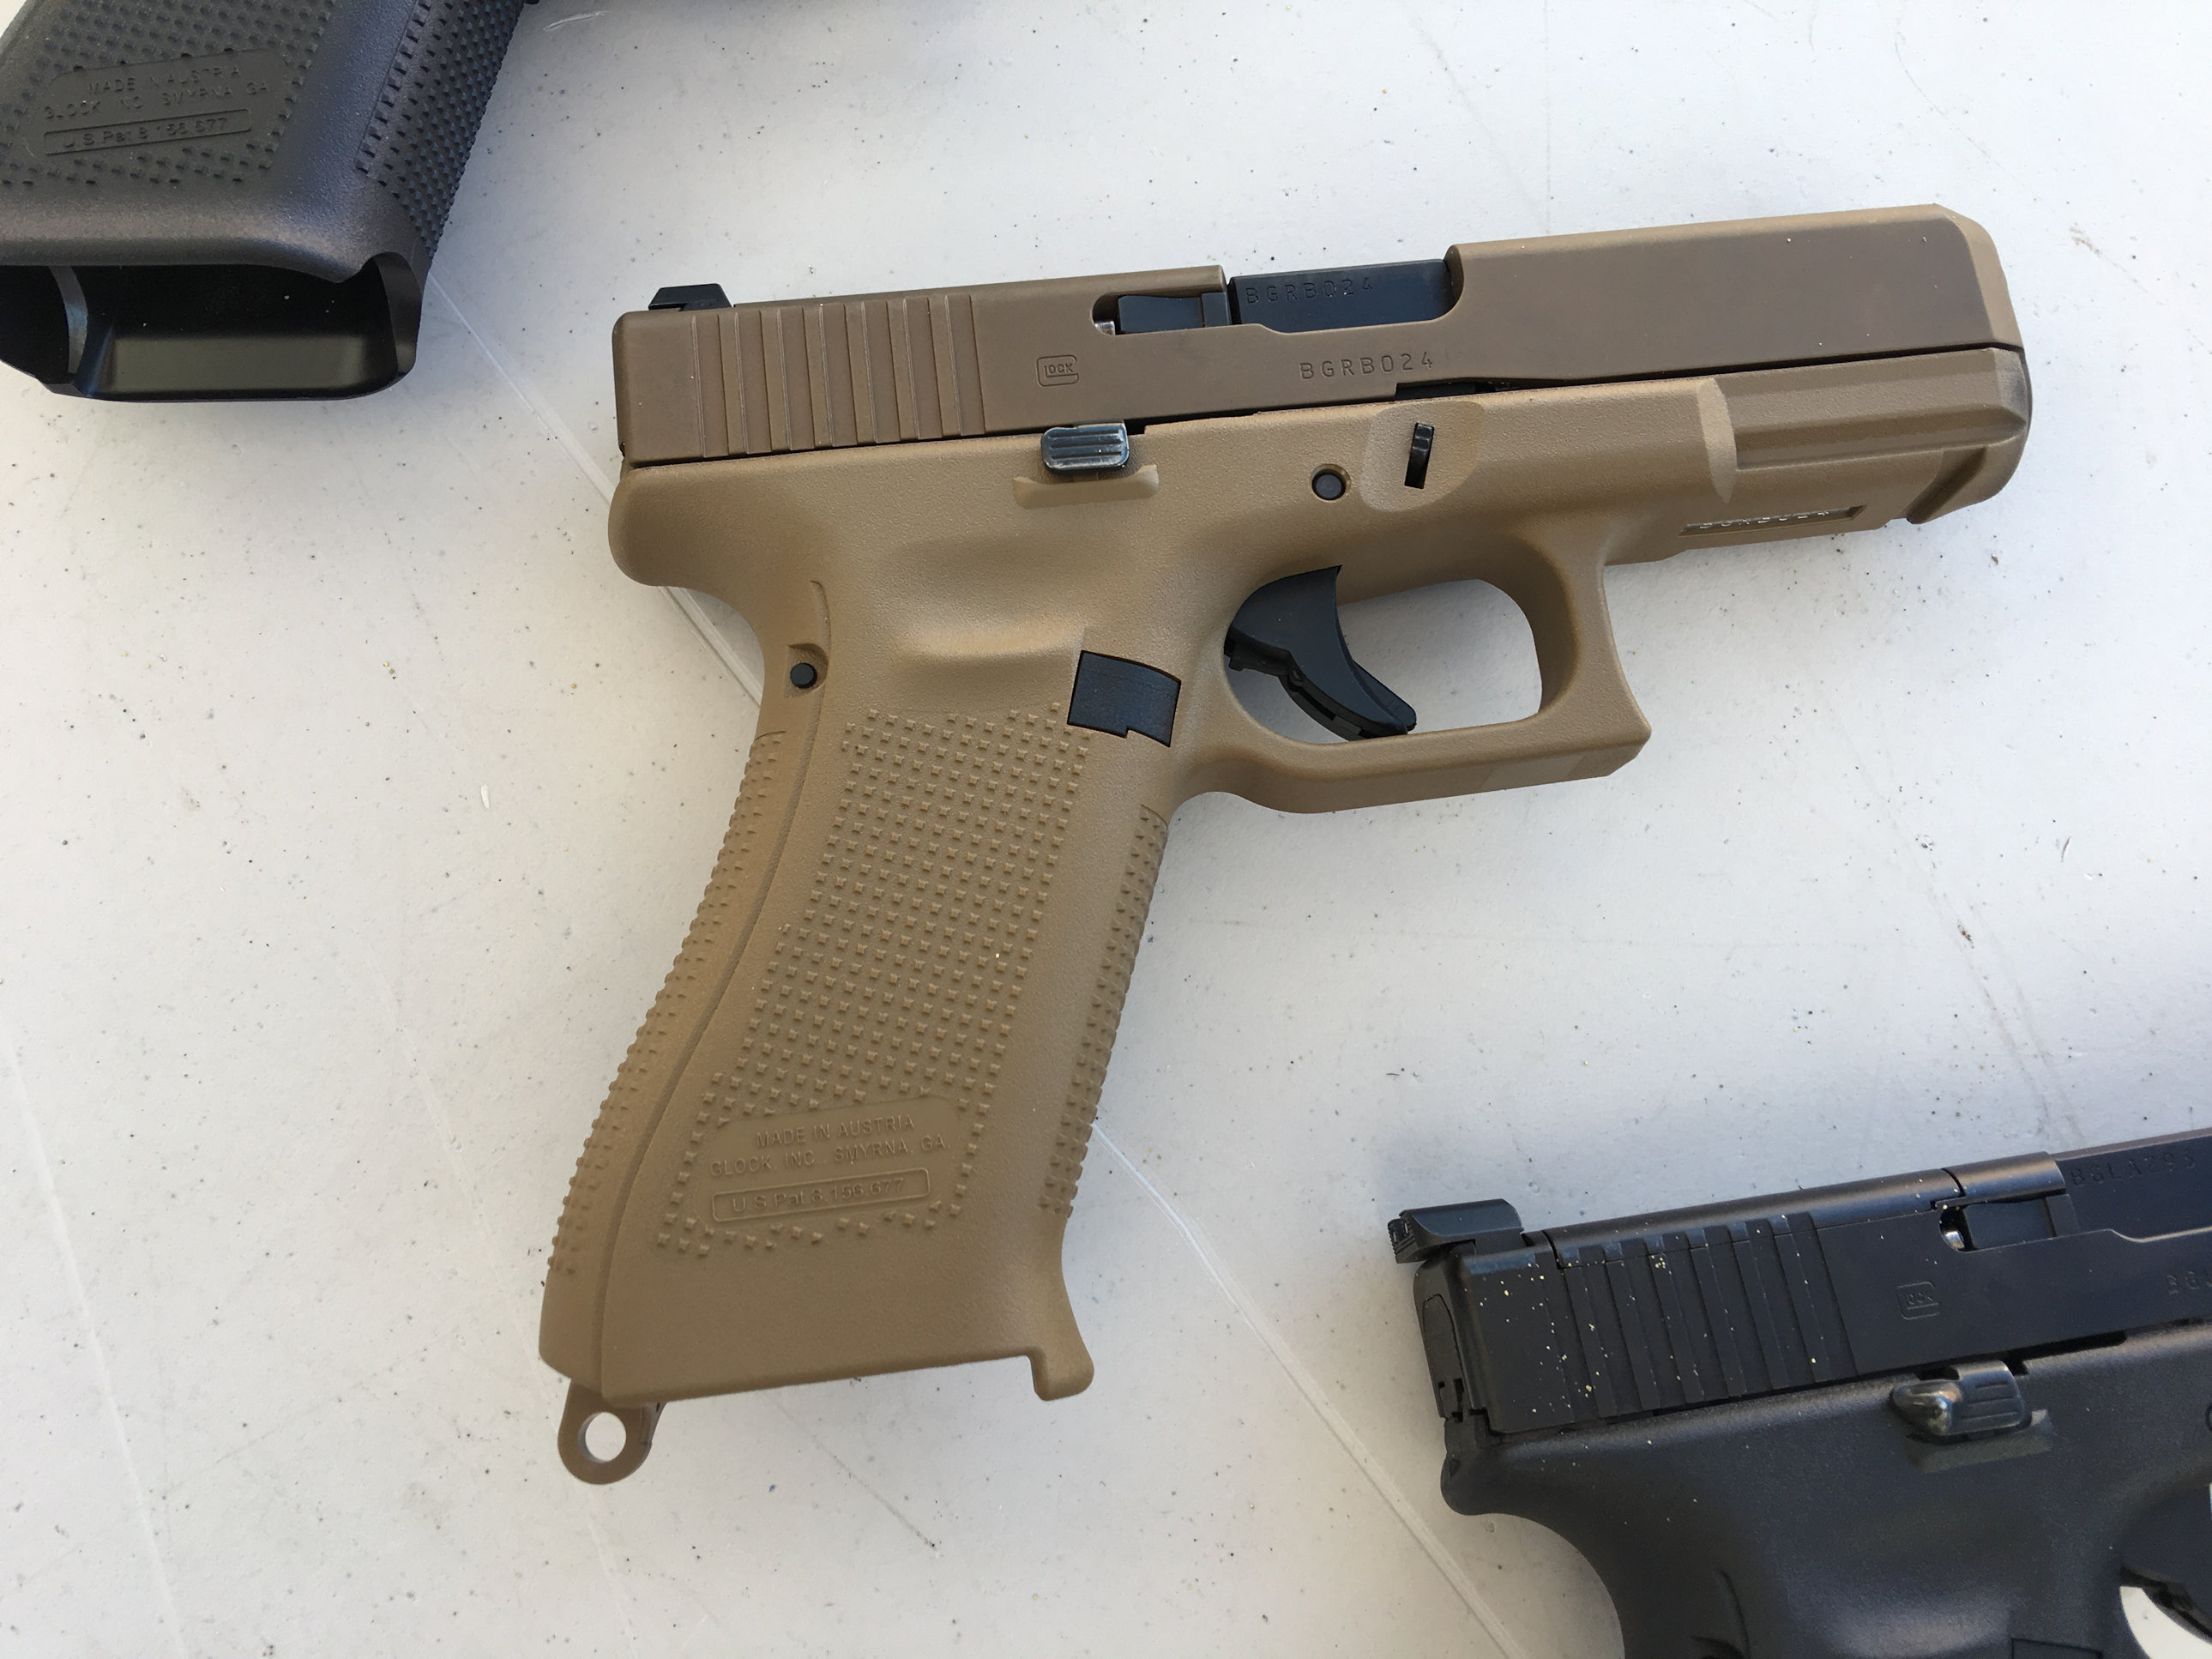 Glock 19X (G19X), Glock 19 (G19) Gen5, Glock 17 (G17) Gen5, and